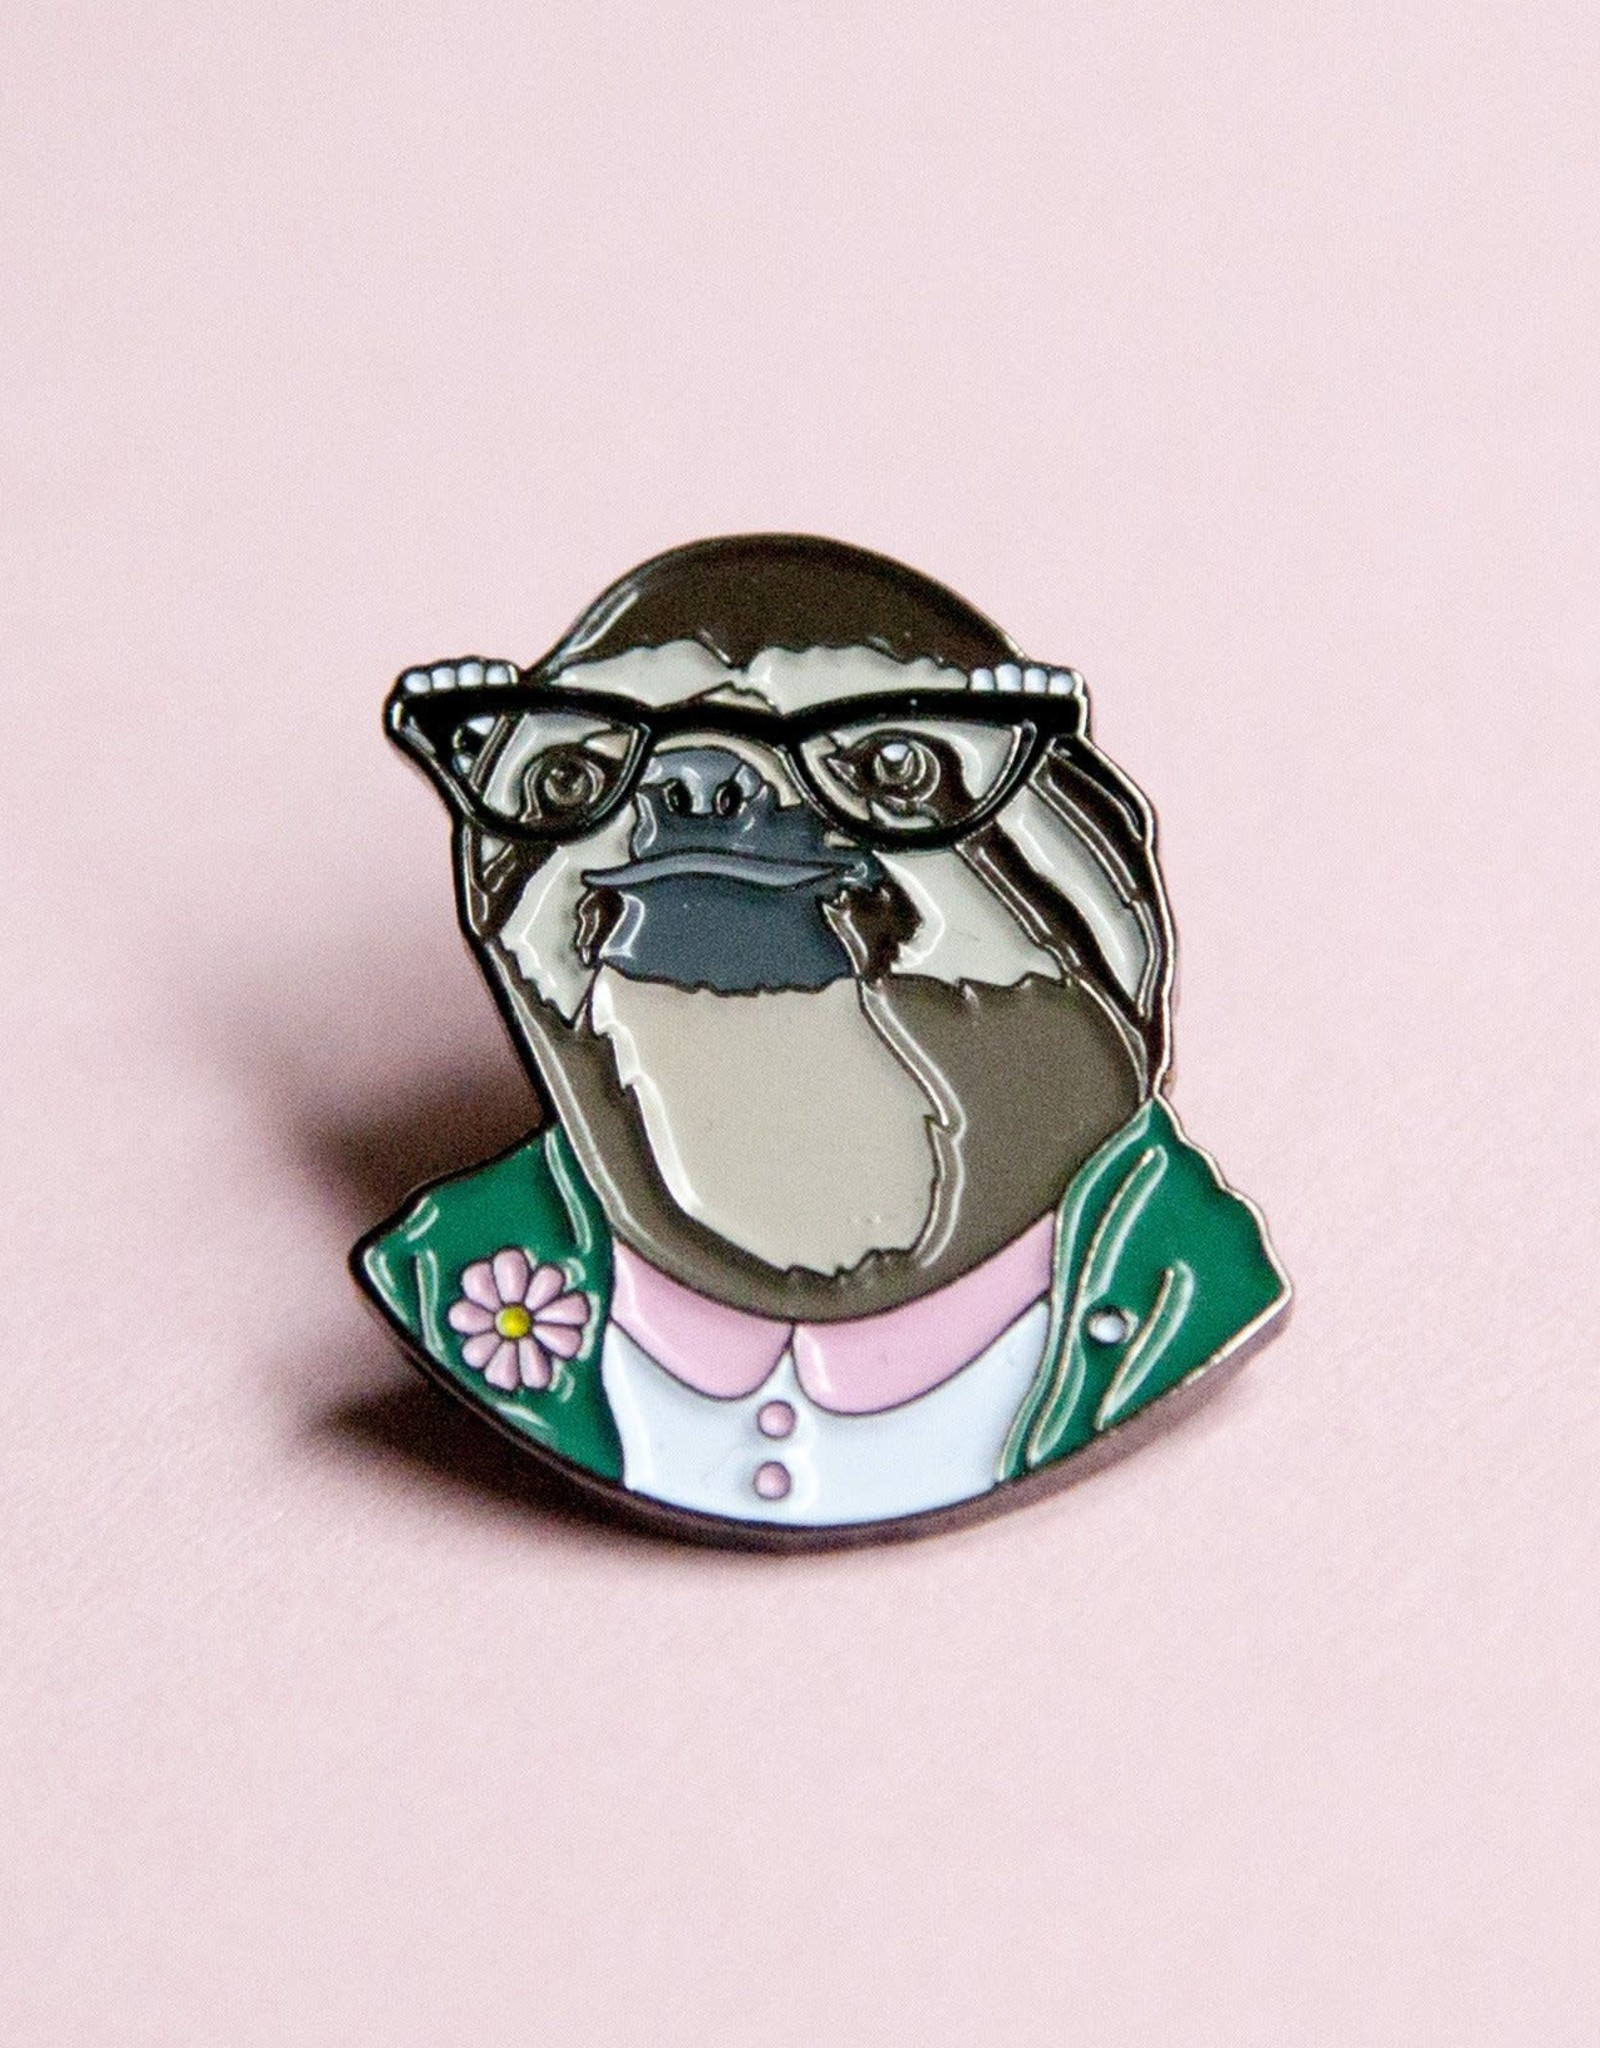 Berkley Illustration ''Sloth lady'' Animal Portrait Enamel Pin - Ryan Berkley